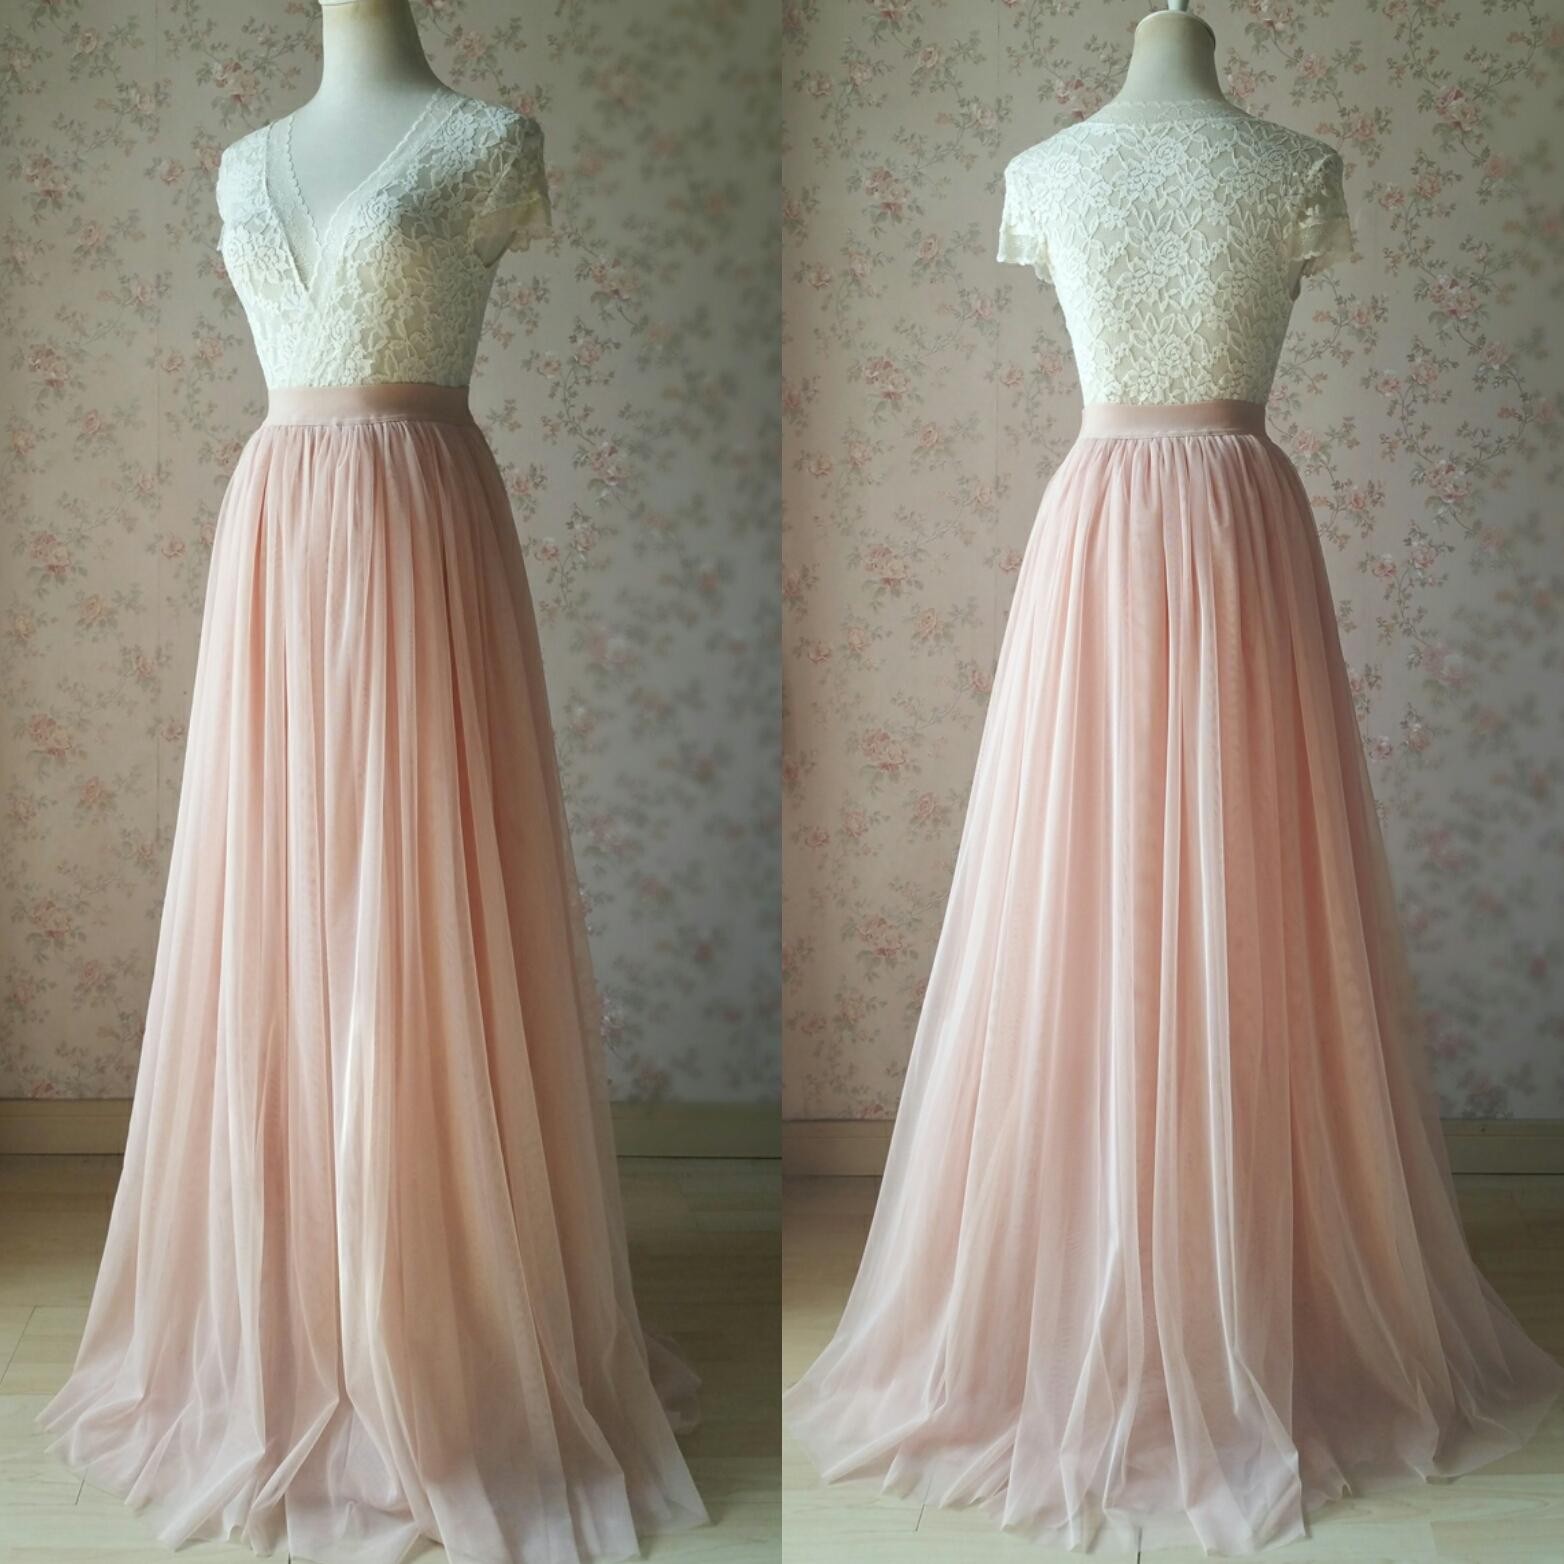 COFFEE High Waisted Plus Size Maxi Skirt Floor Length Bridesmaid Tulle Skirt NWT image 11